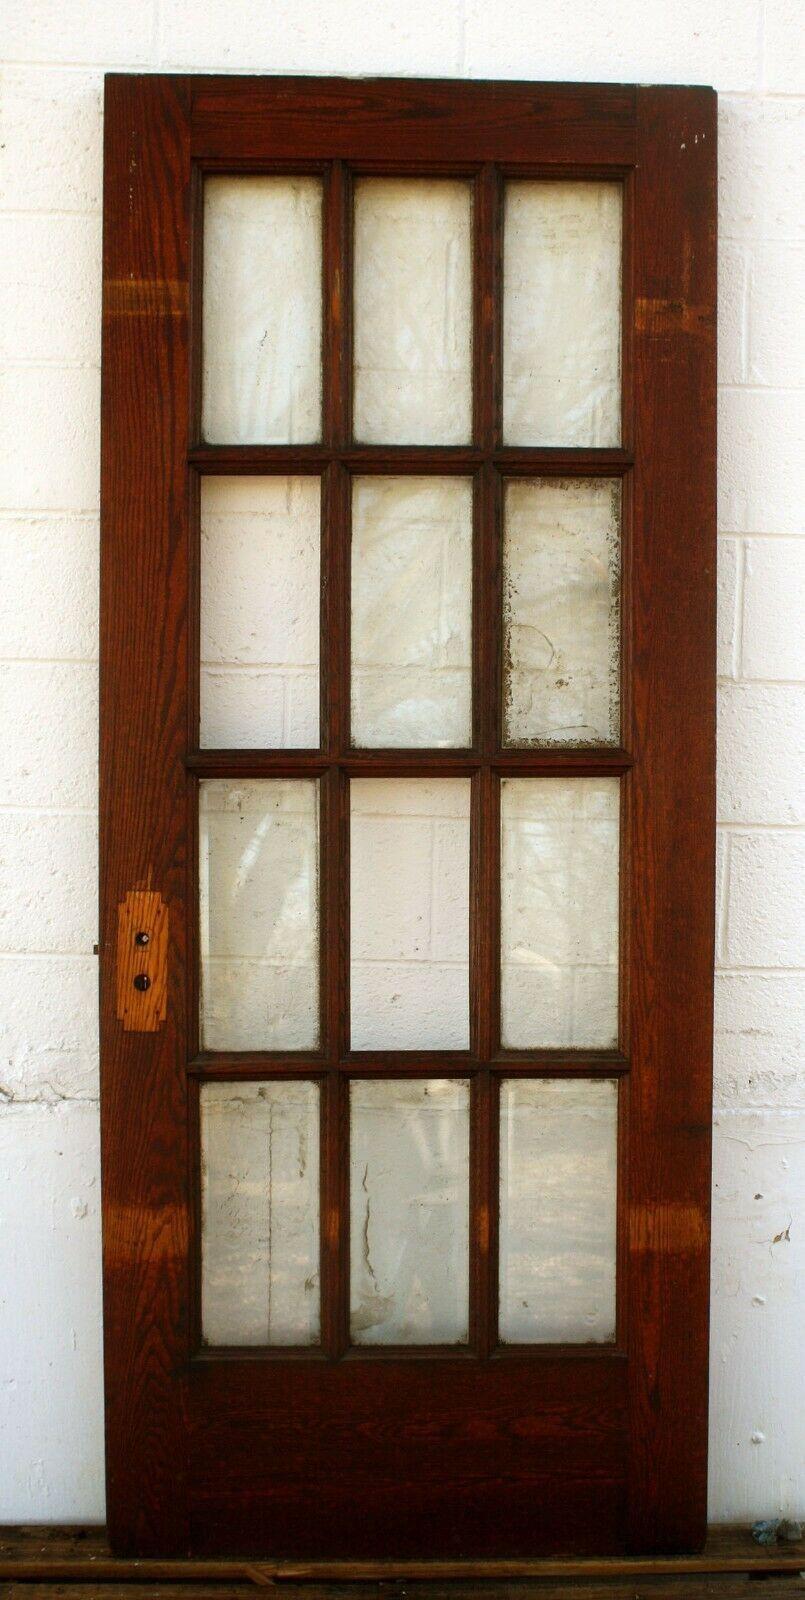 32 X80 X1 75 Antique Vintage Oak Wood Wooden French Door 12 Window Beveled Glass Wooden French Doors Antique French Doors Beveled Glass